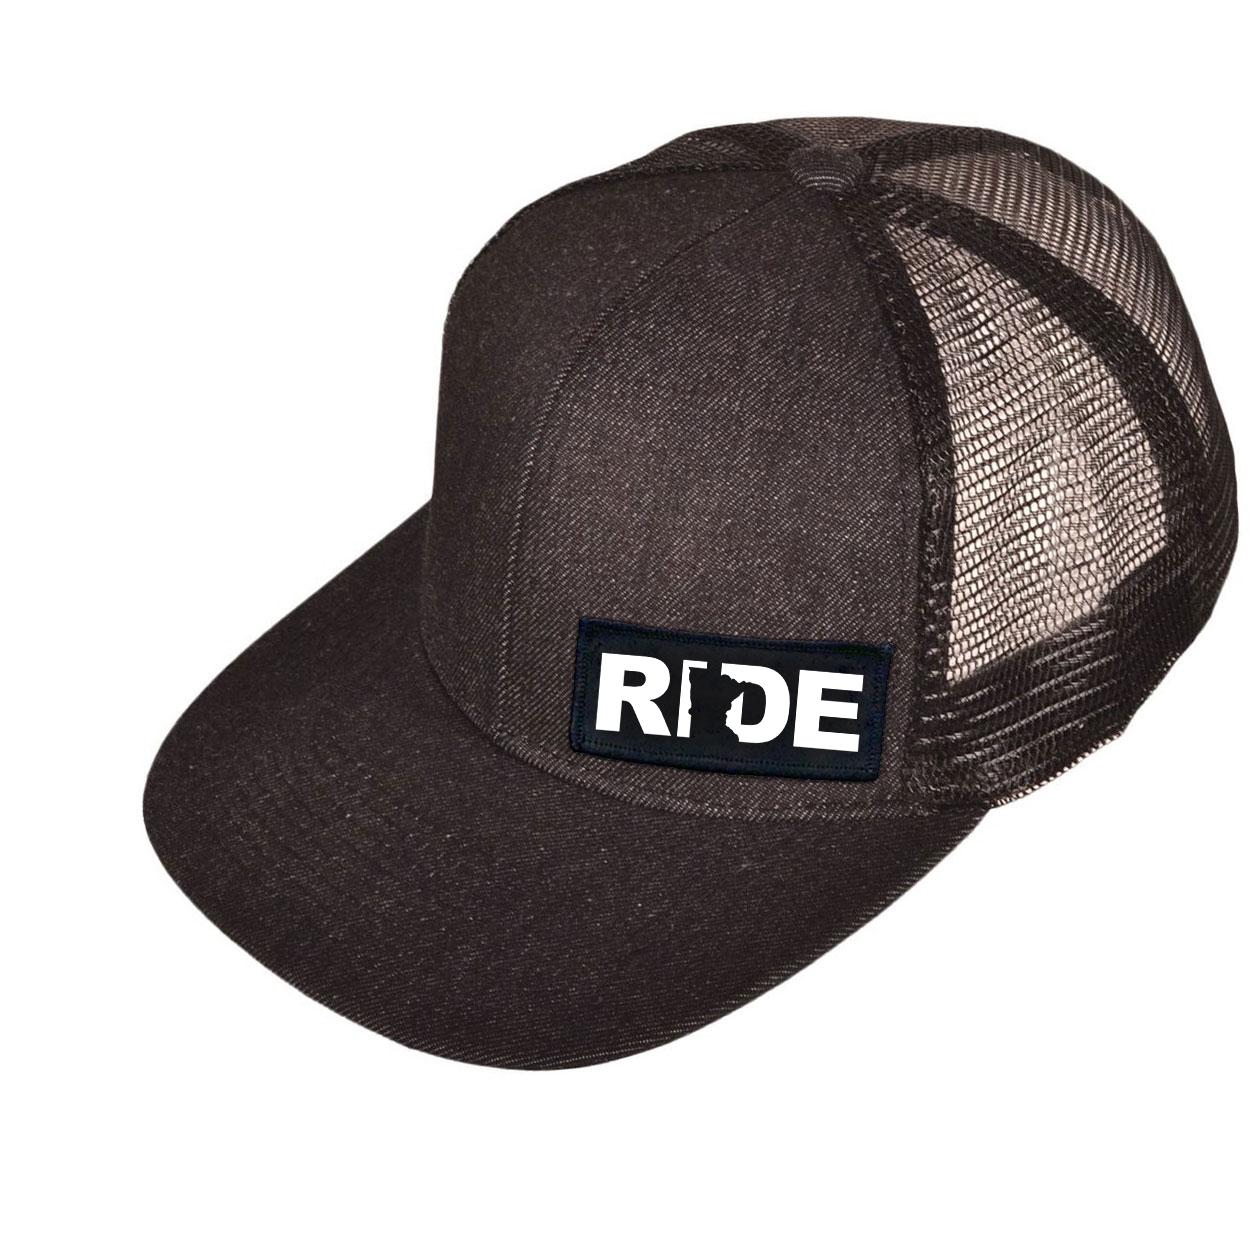 Ride Minnesota Night Out Woven Patch Snapback Flat Brim Hat Black Denim (White Logo)